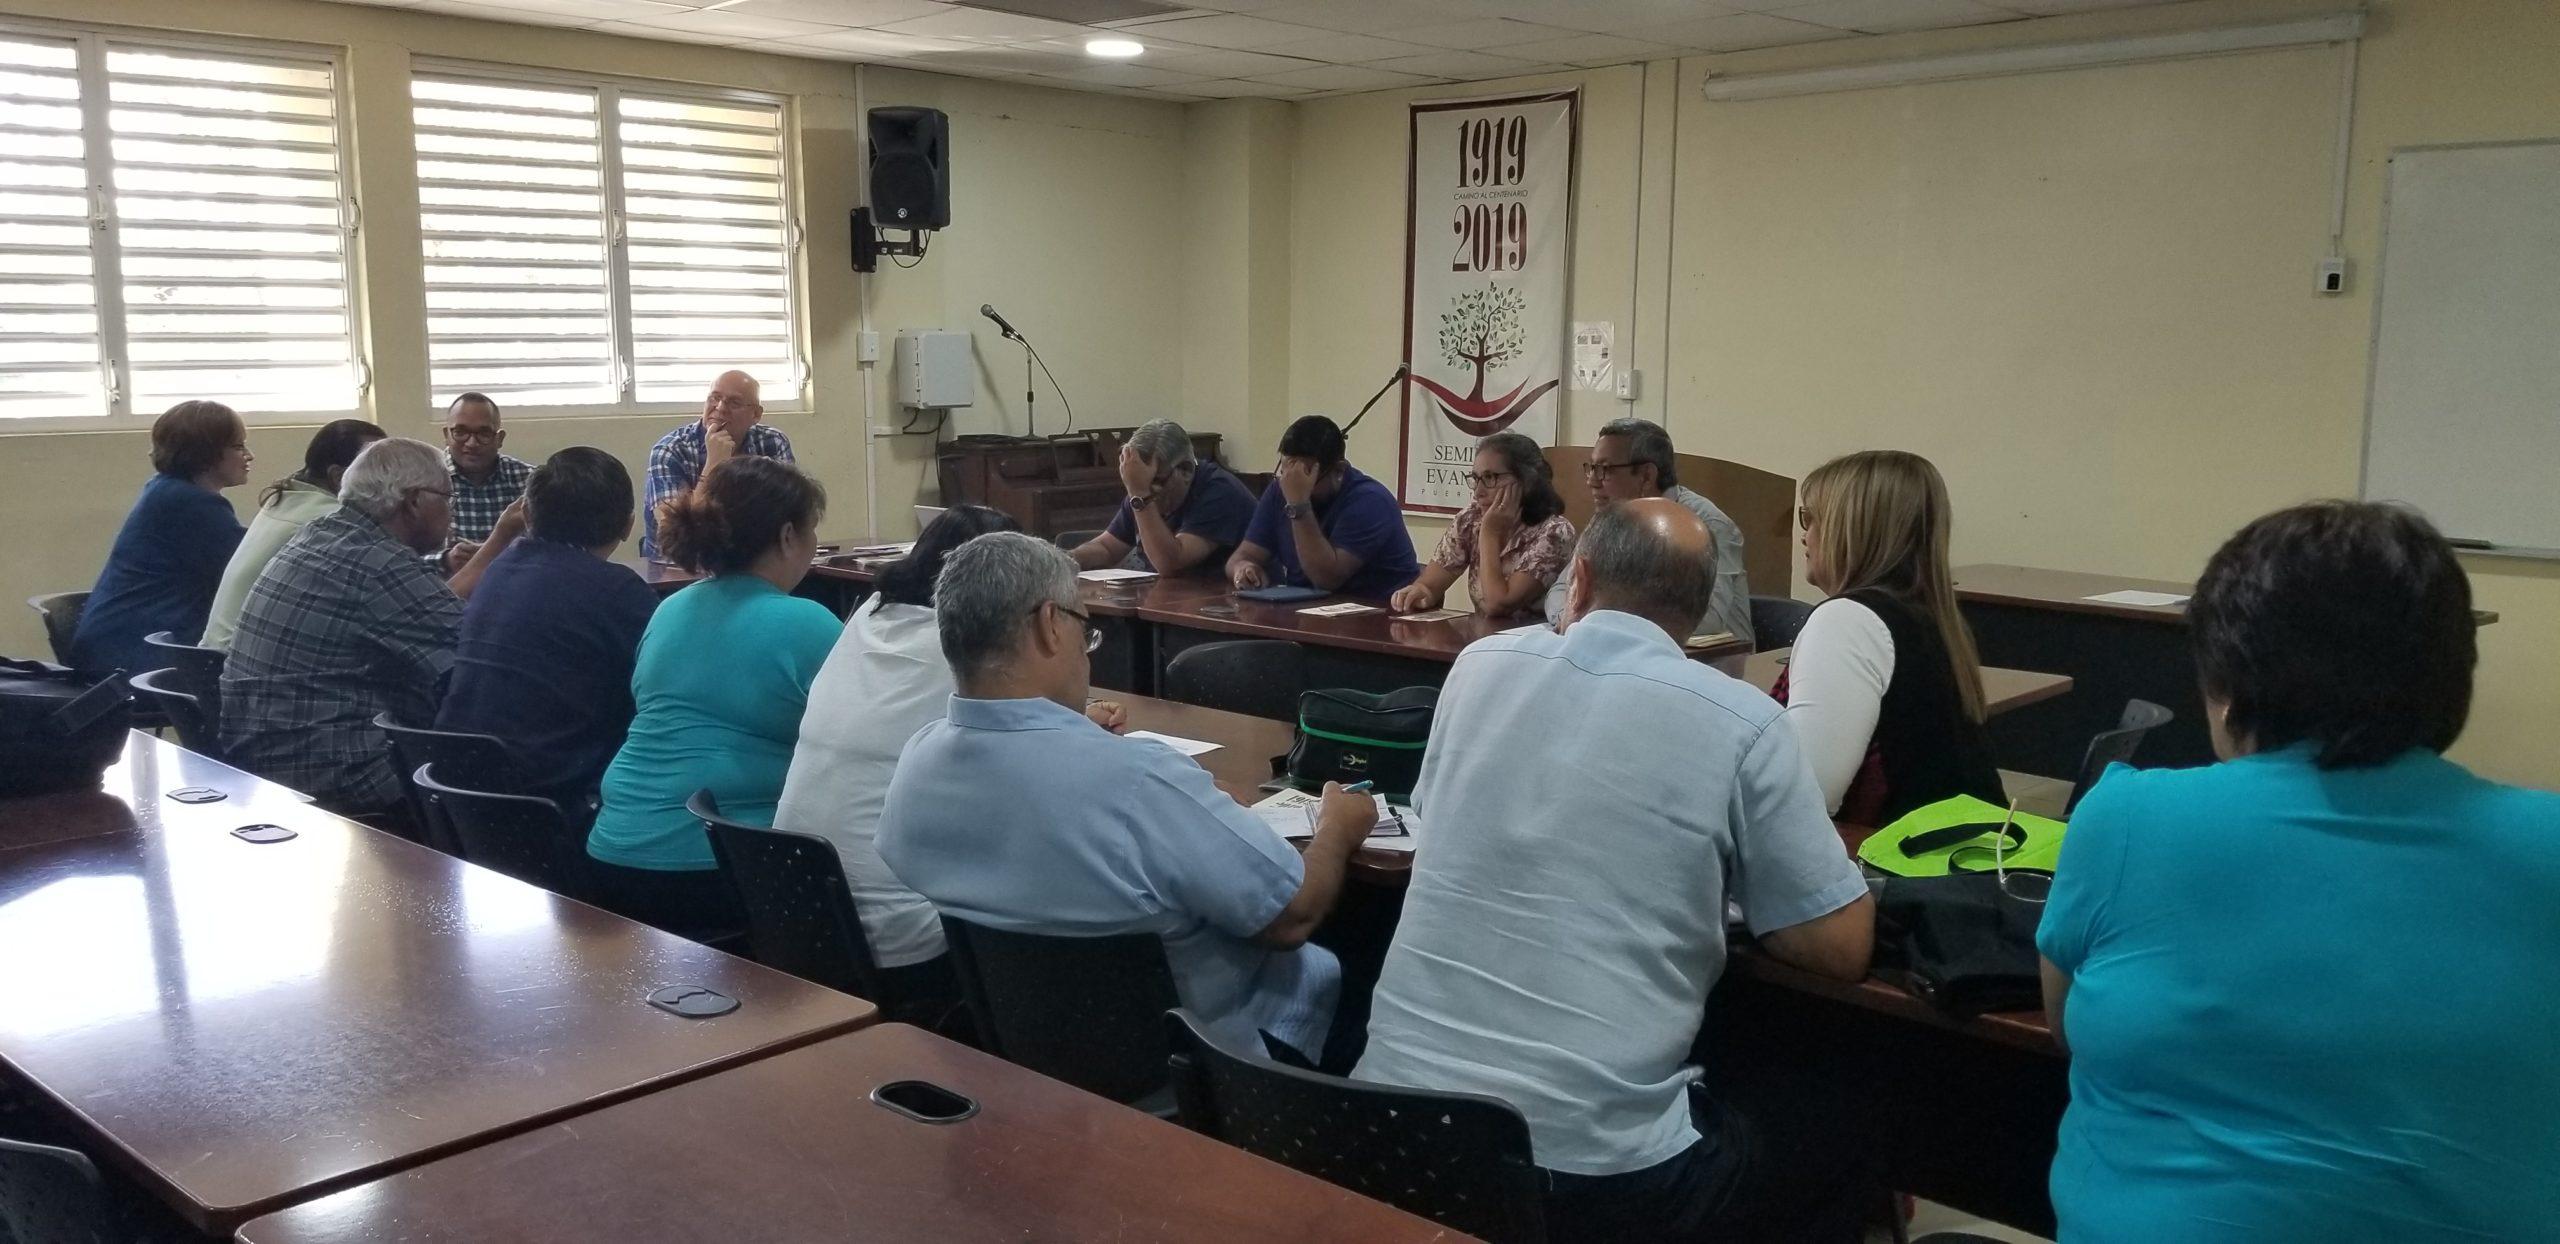 puerto_rico_paraguay_partnership_visit_Angel_20190218_110521.jpeg